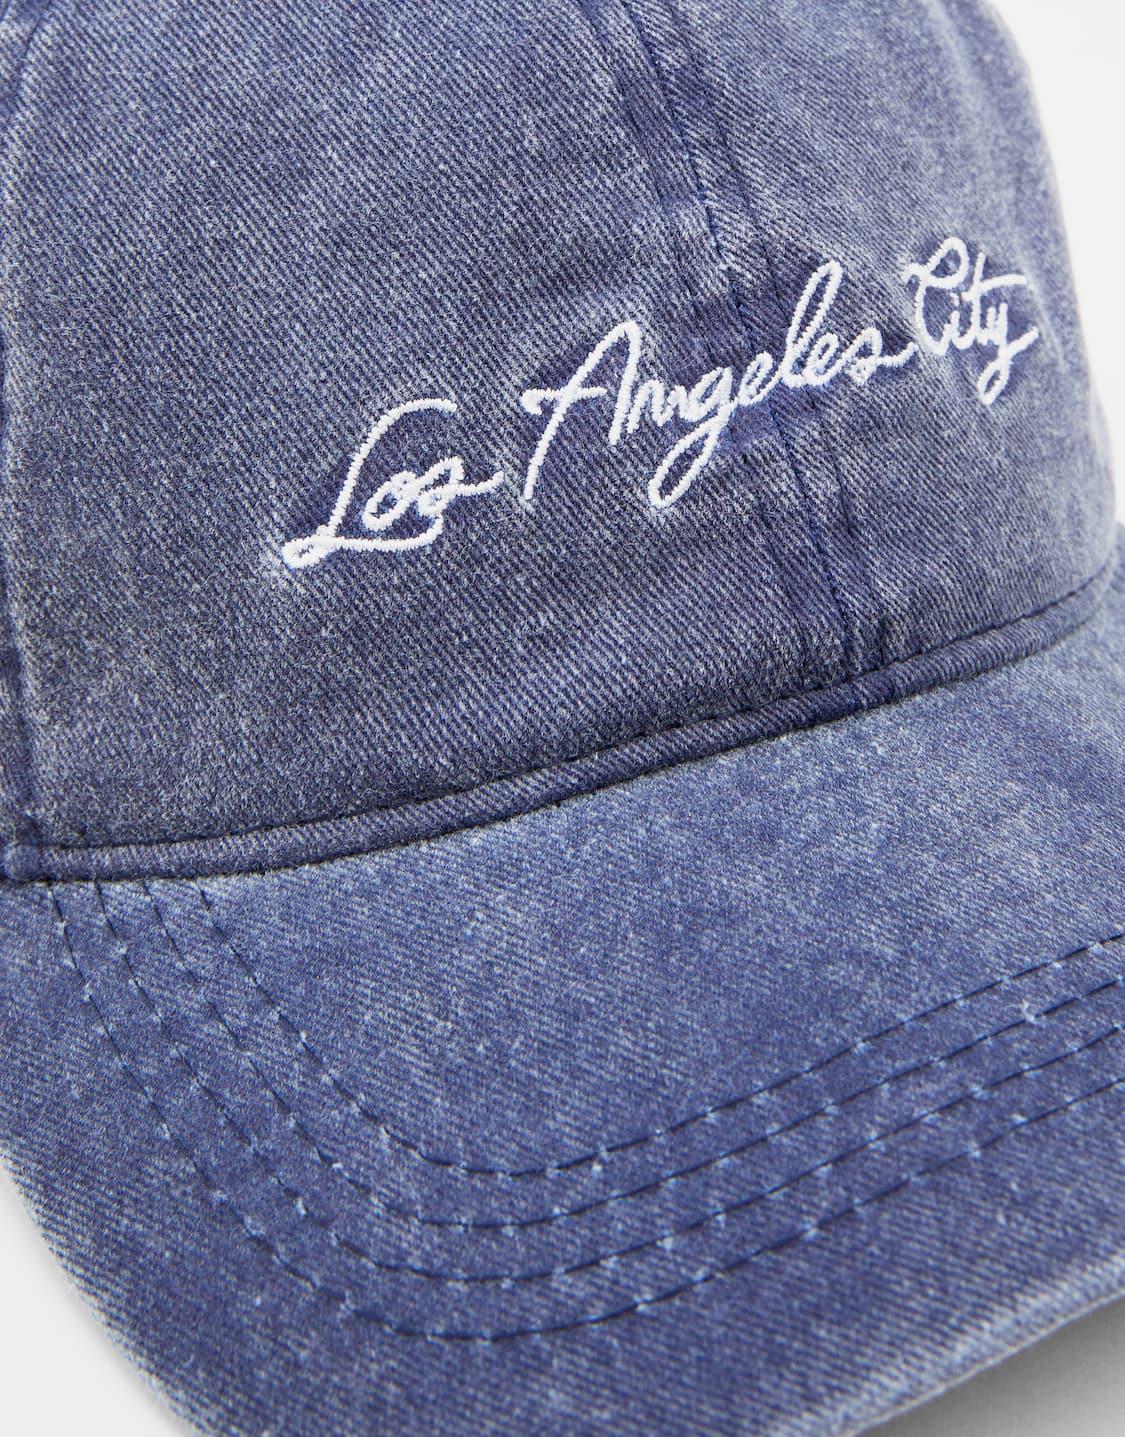 Gorra Los Ángeles City - PULL BEAR 63b6109c5c5